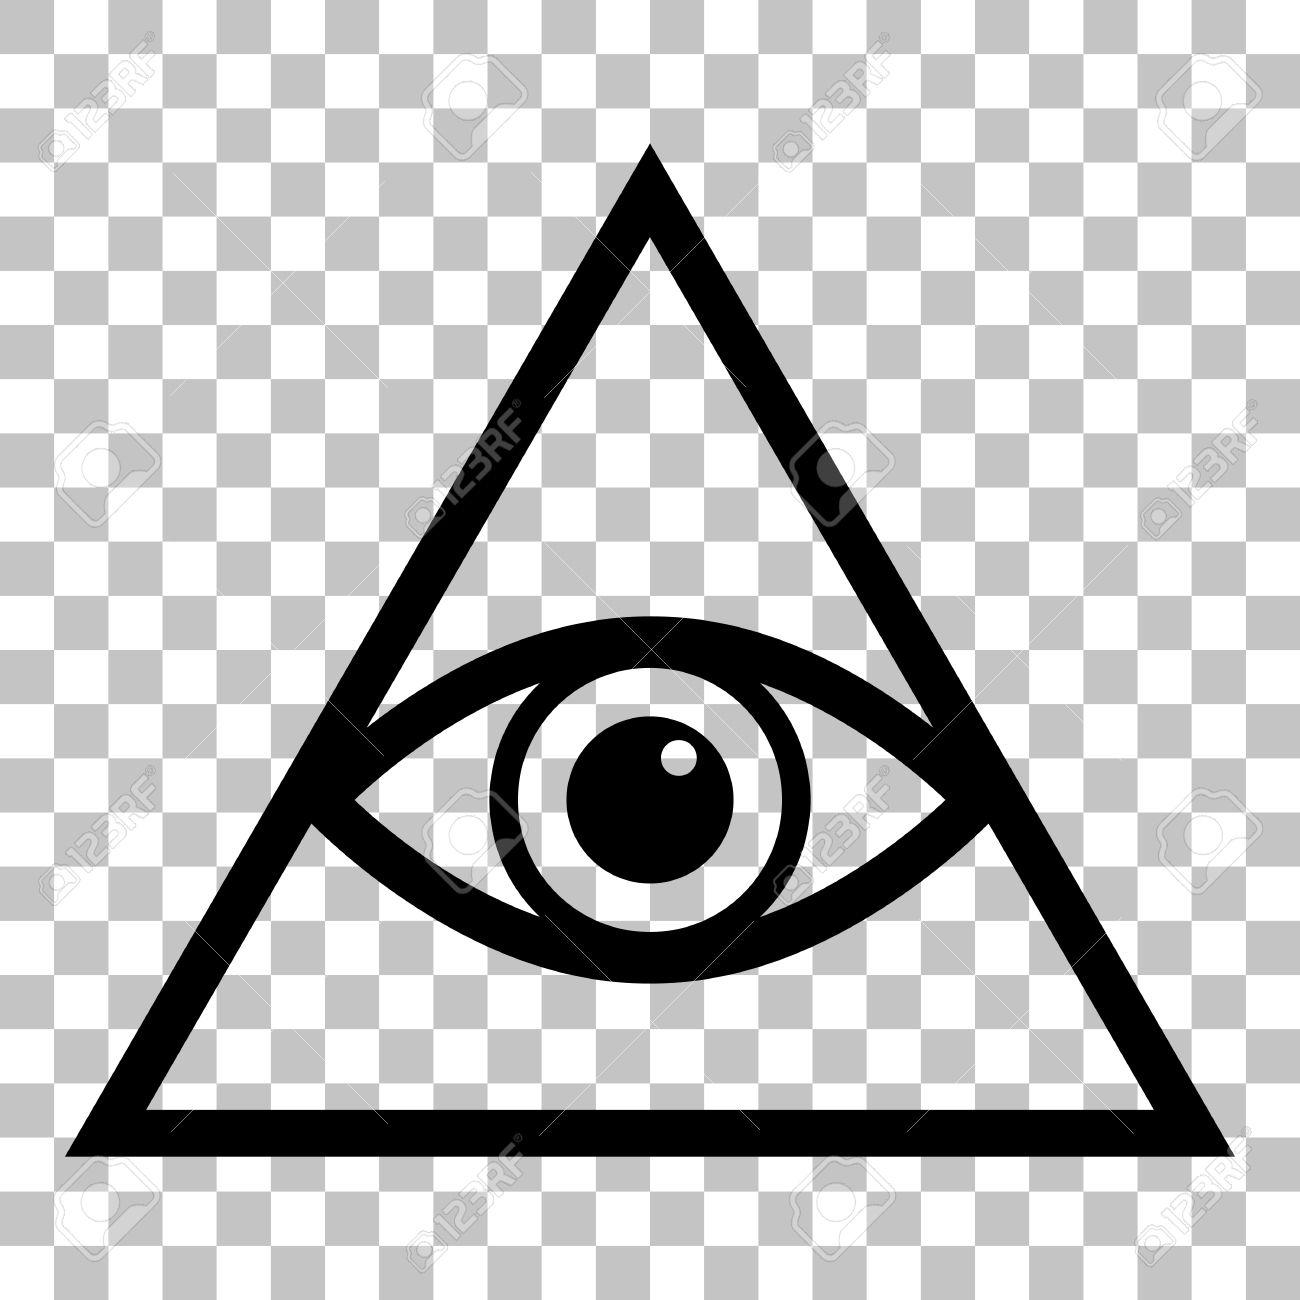 All Seeing Eye Pyramid Symbol Freemason And Spiritual Flat Style Black Icon On Transparent